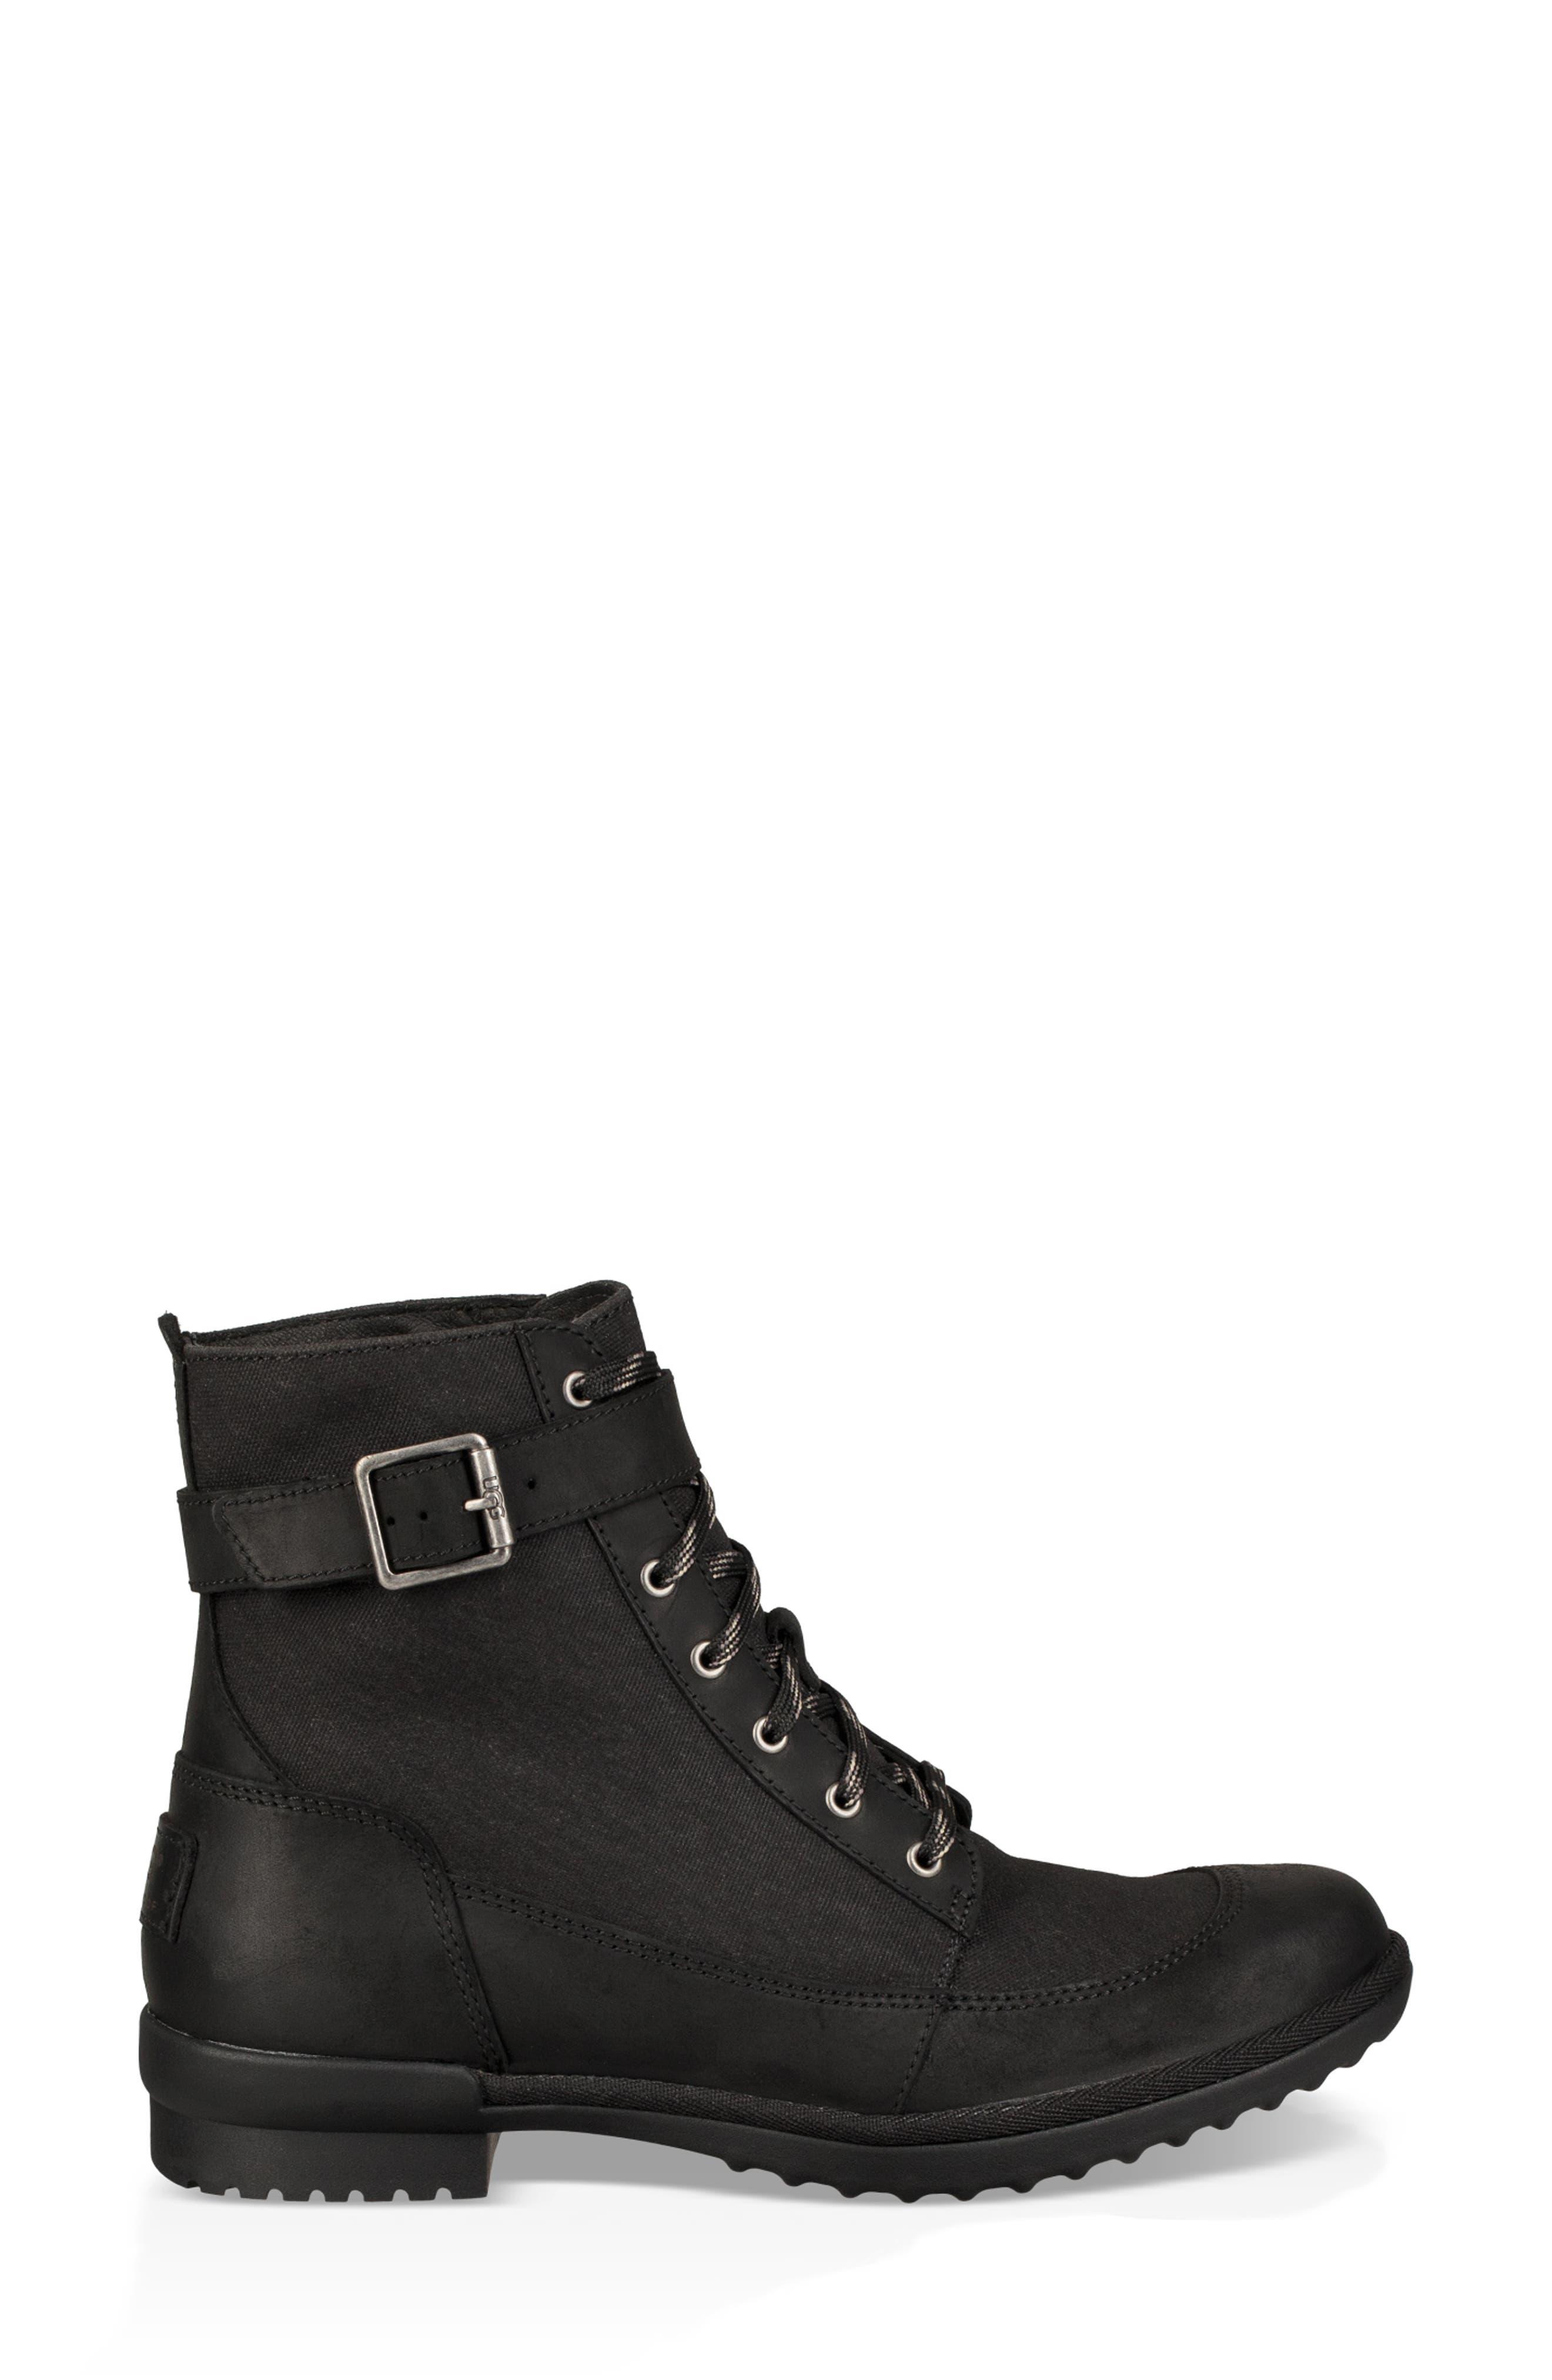 UGG | Tulane Waterproof Wool Lined Boot